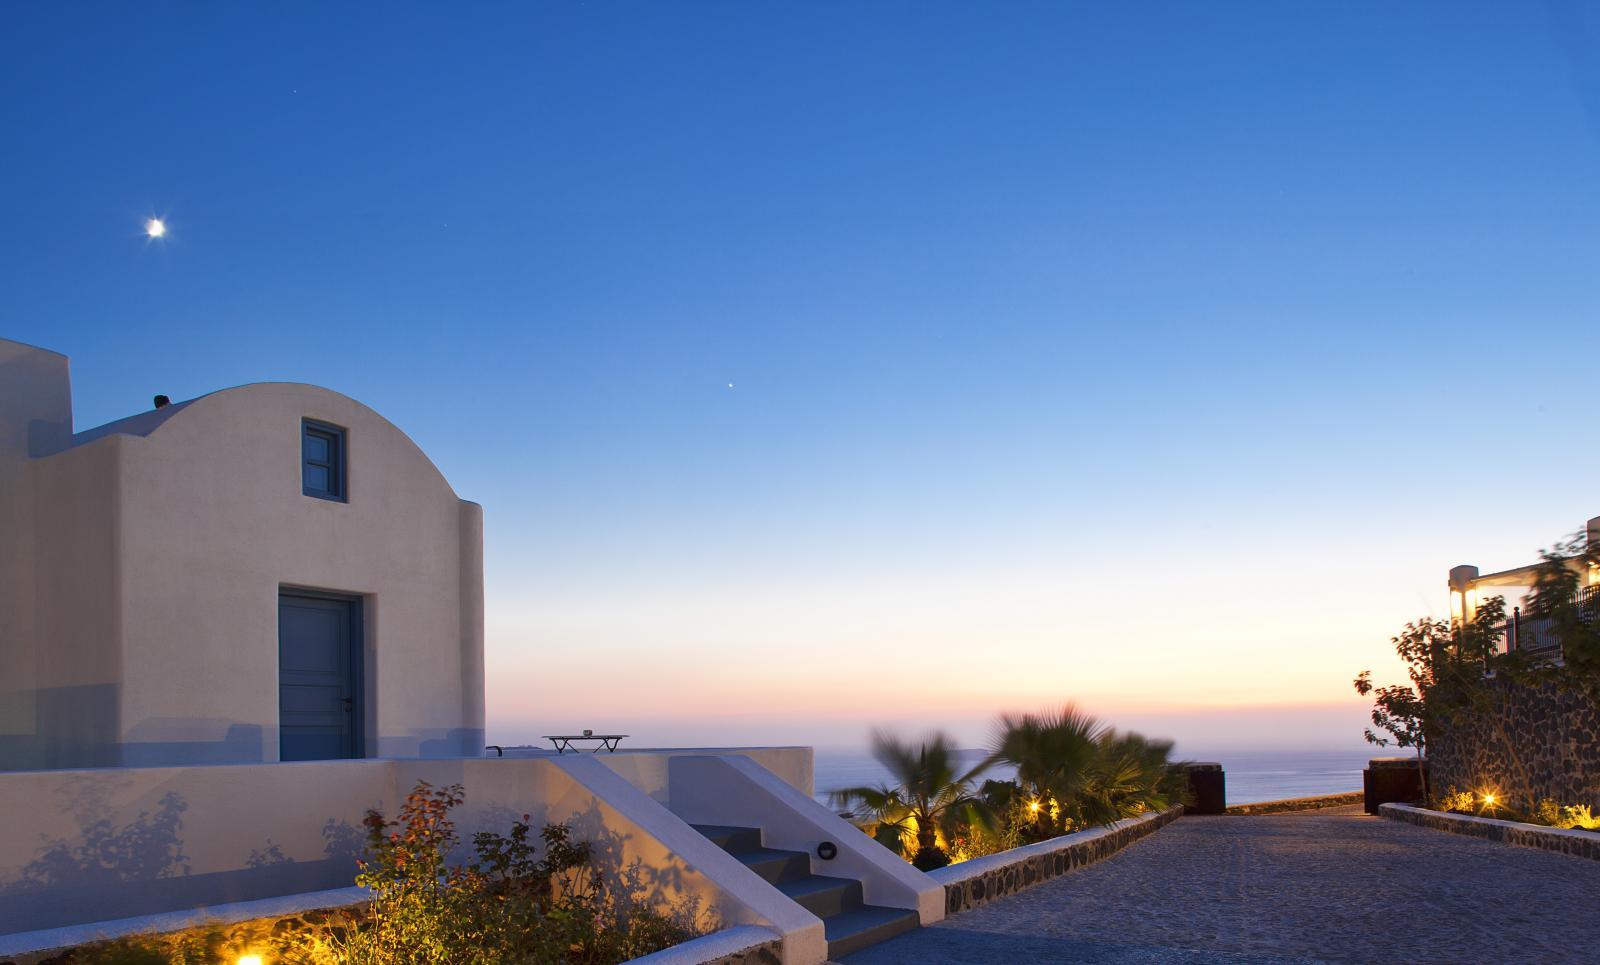 santorini villas caldera view